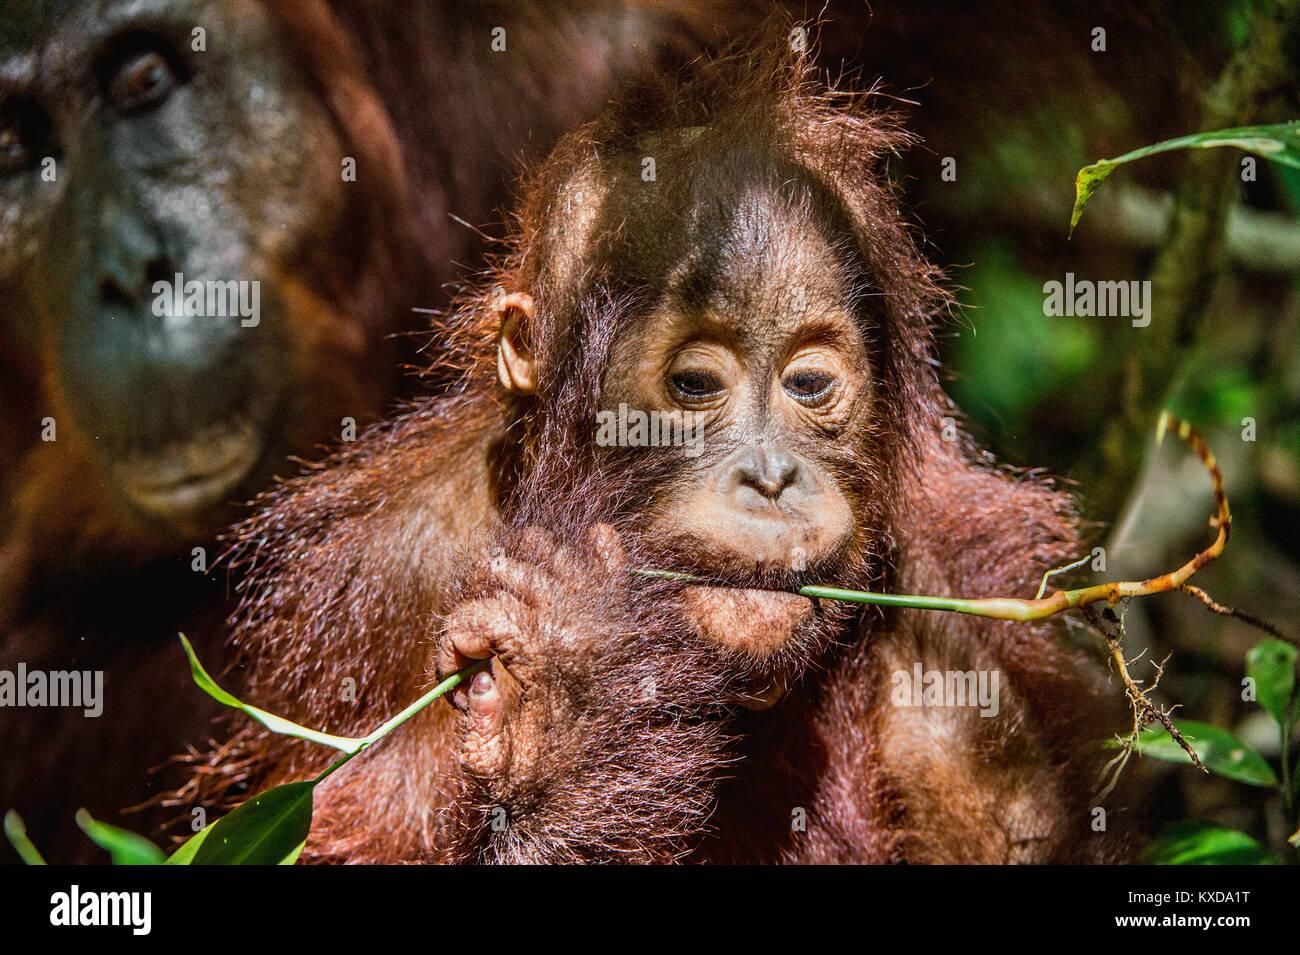 Close up portrait of Orangutan cub in a natural habitat.  Central Bornean orangutan (Pongo pygmaeus wurmbii) in - Stock Image